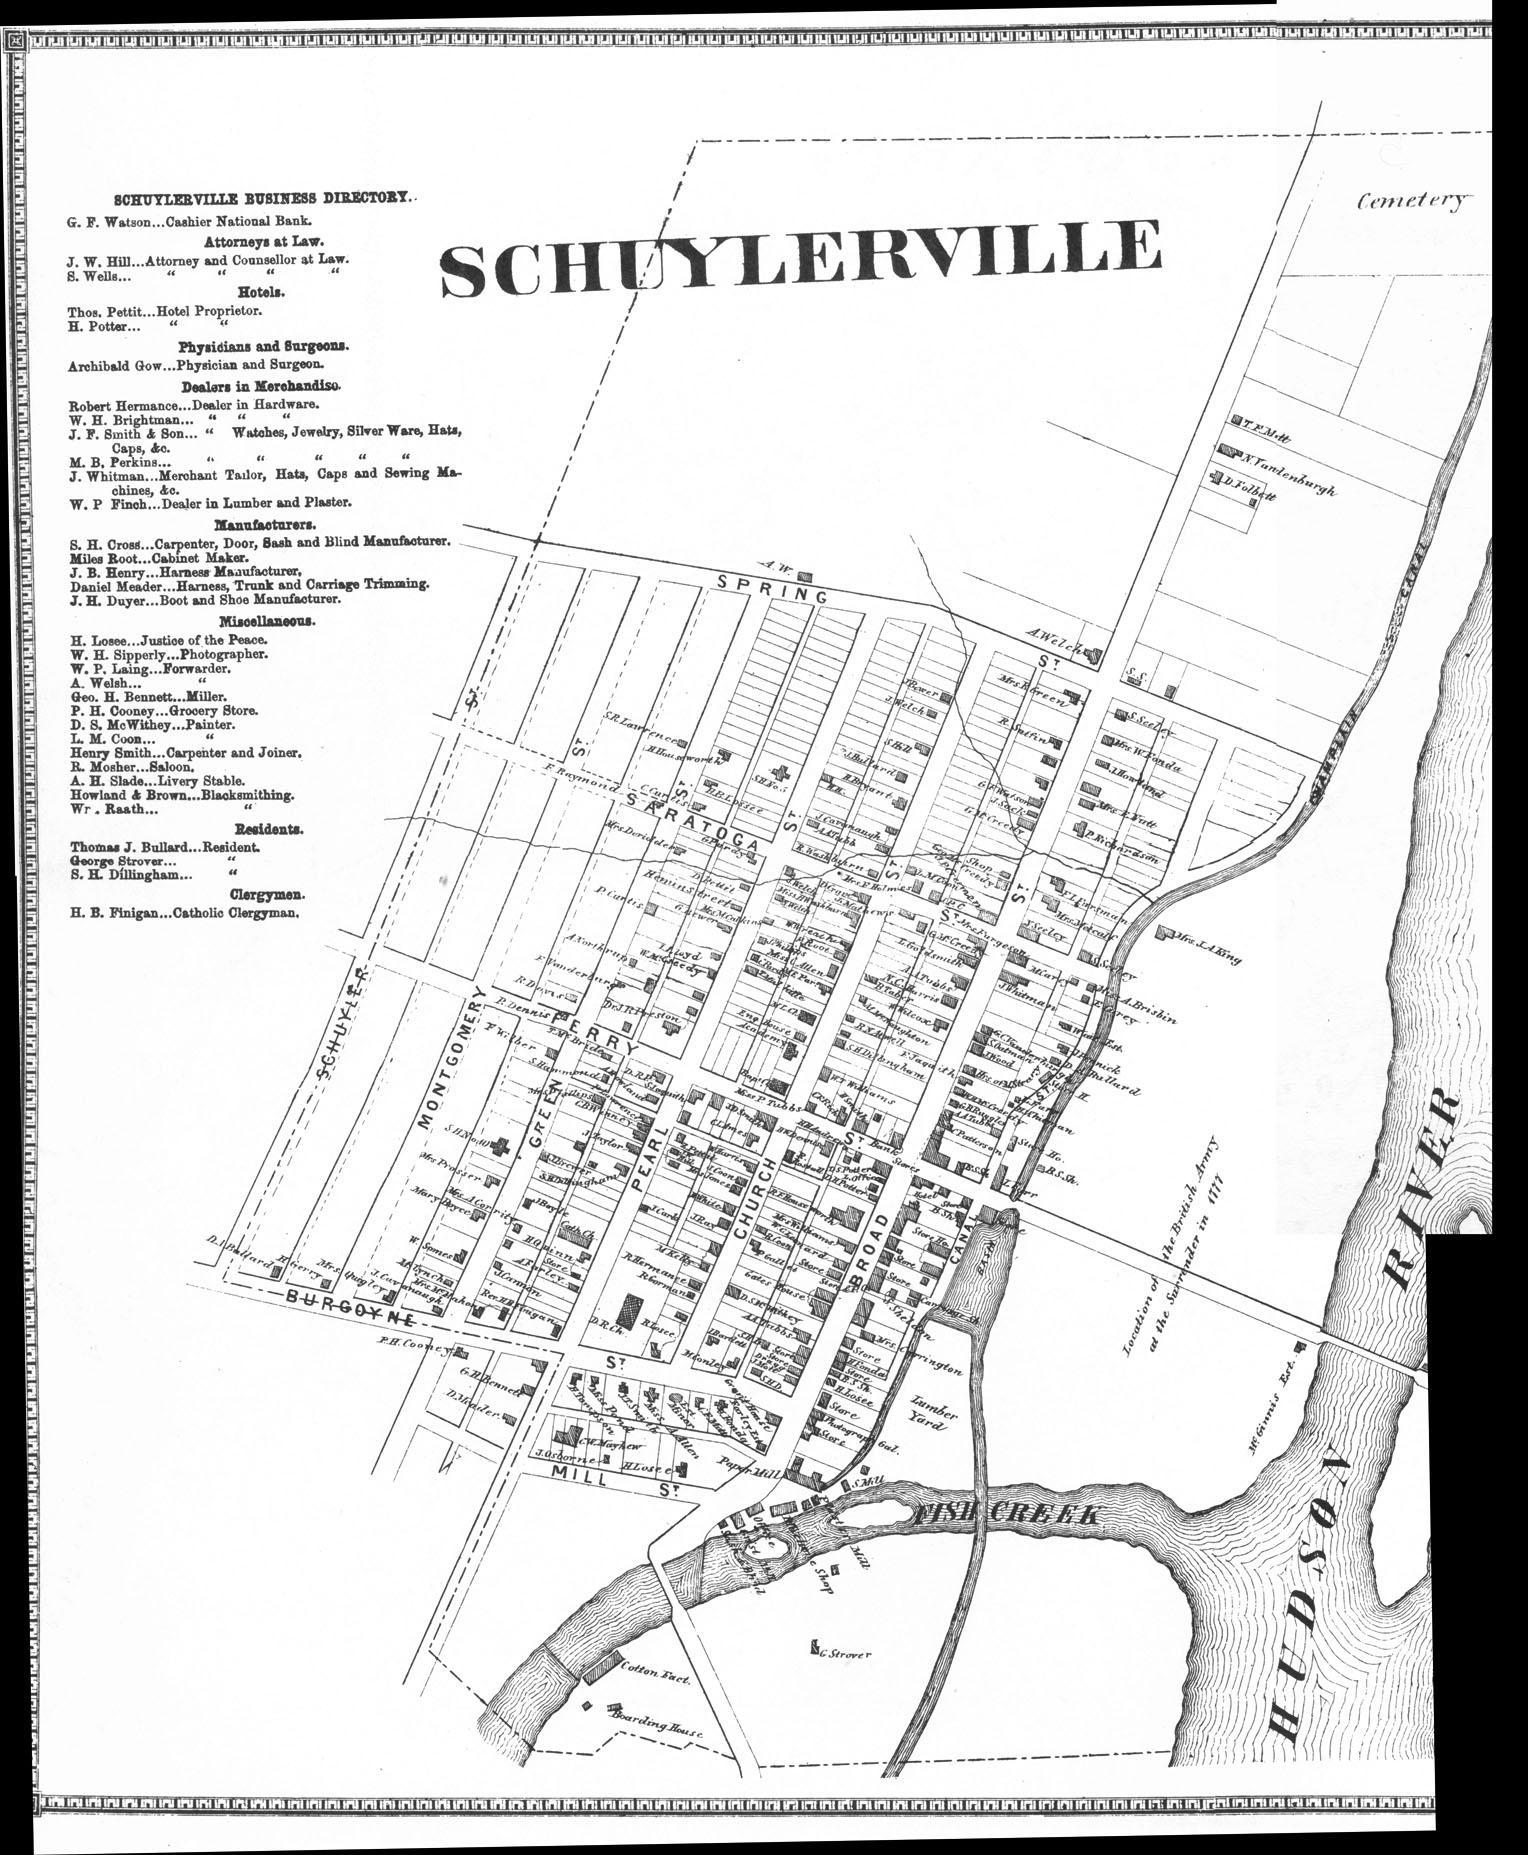 Schuylerville